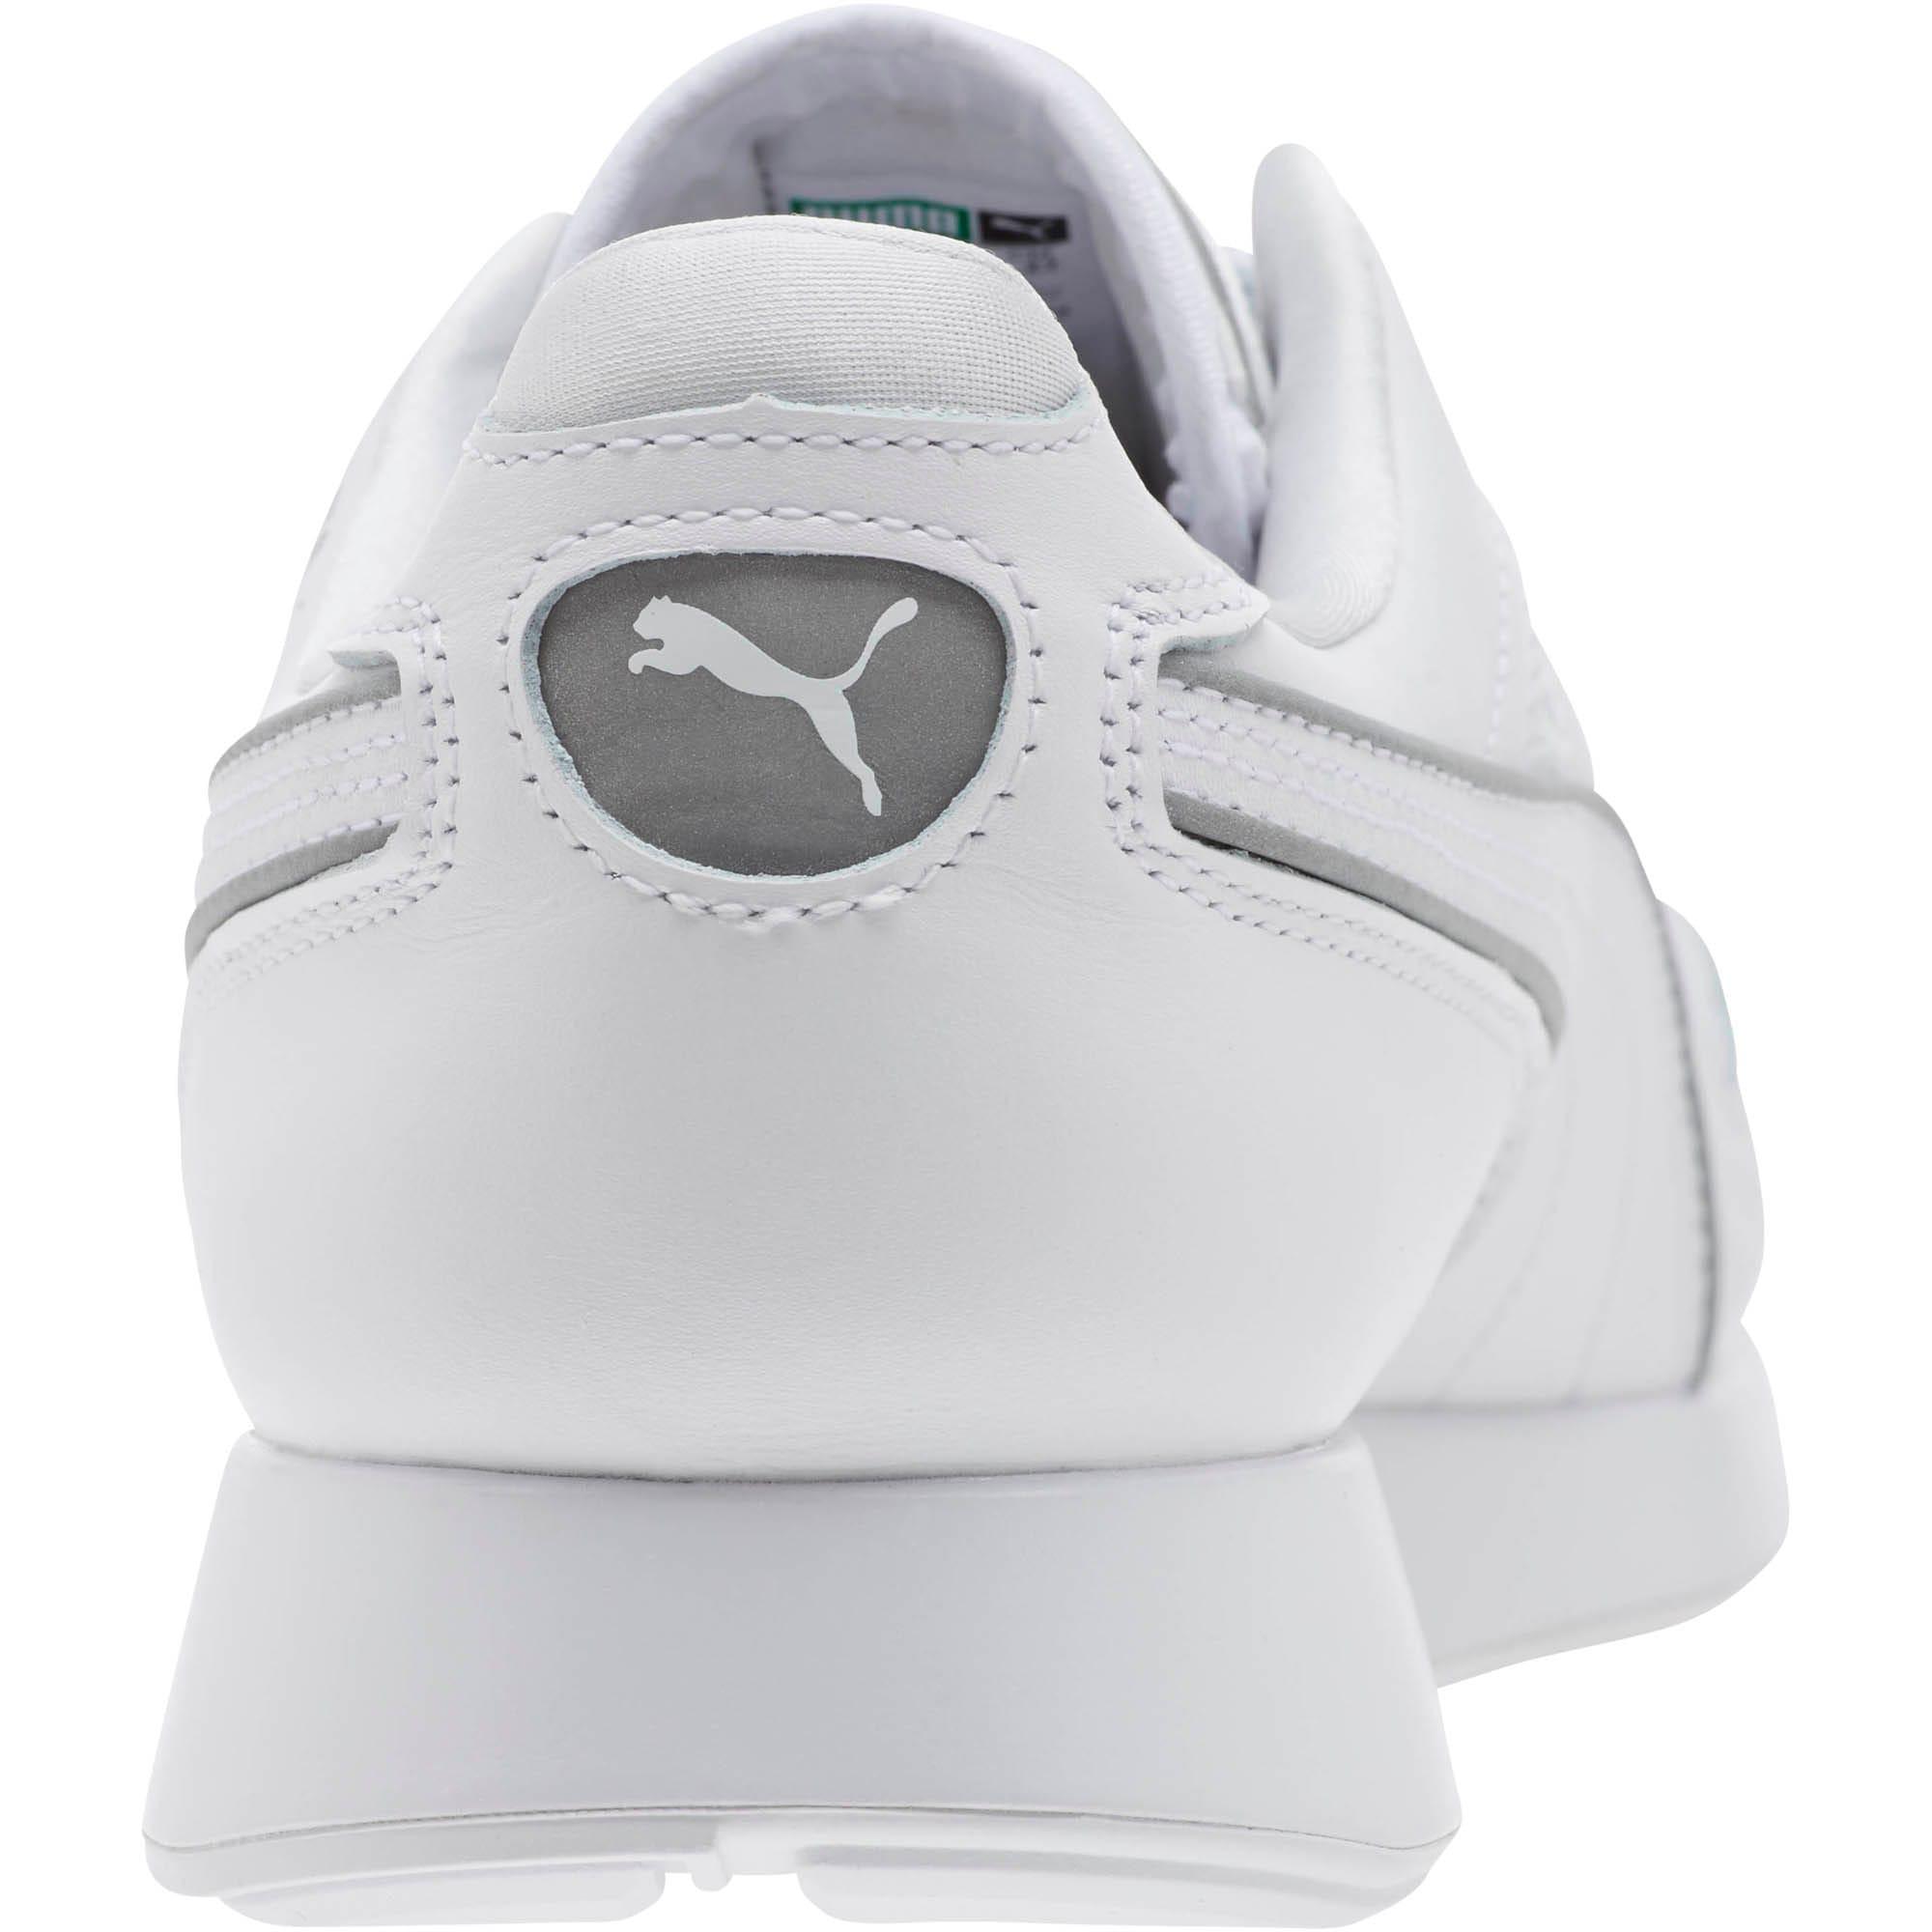 Thumbnail 4 of RS-100 Optic Men's Sneakers, P White-P Silver-Puma White, medium